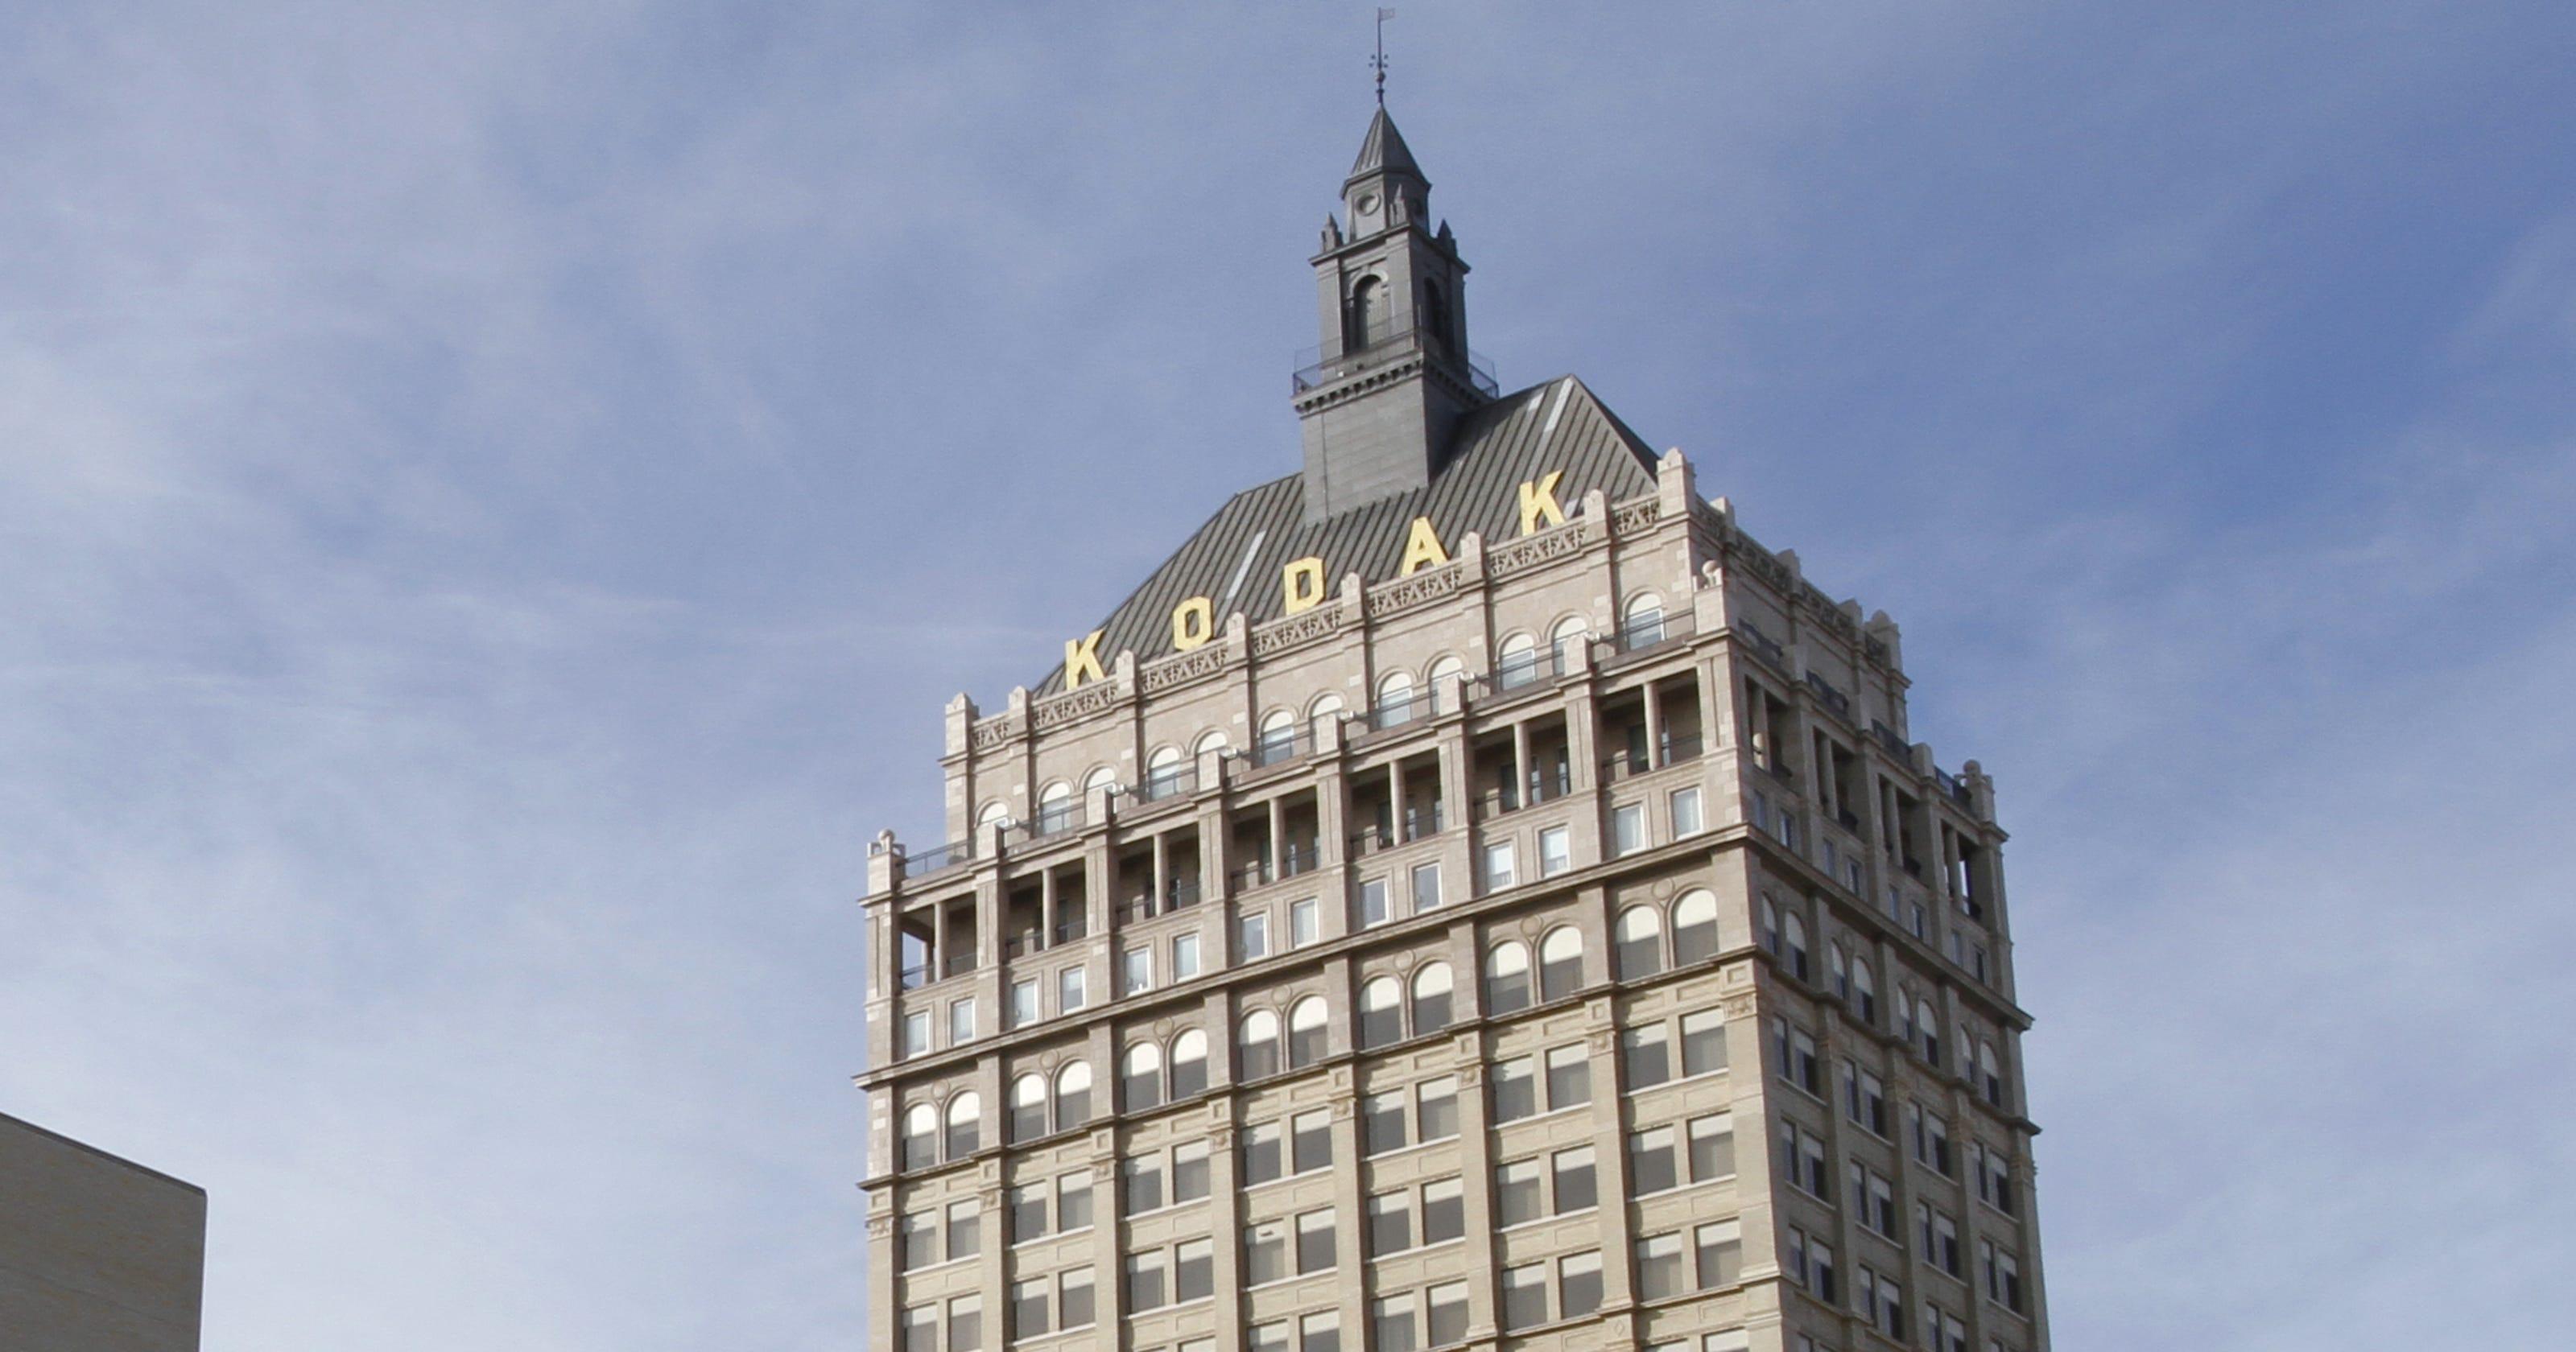 Kodak shares soar as it starts kodak coin cryptocurrency